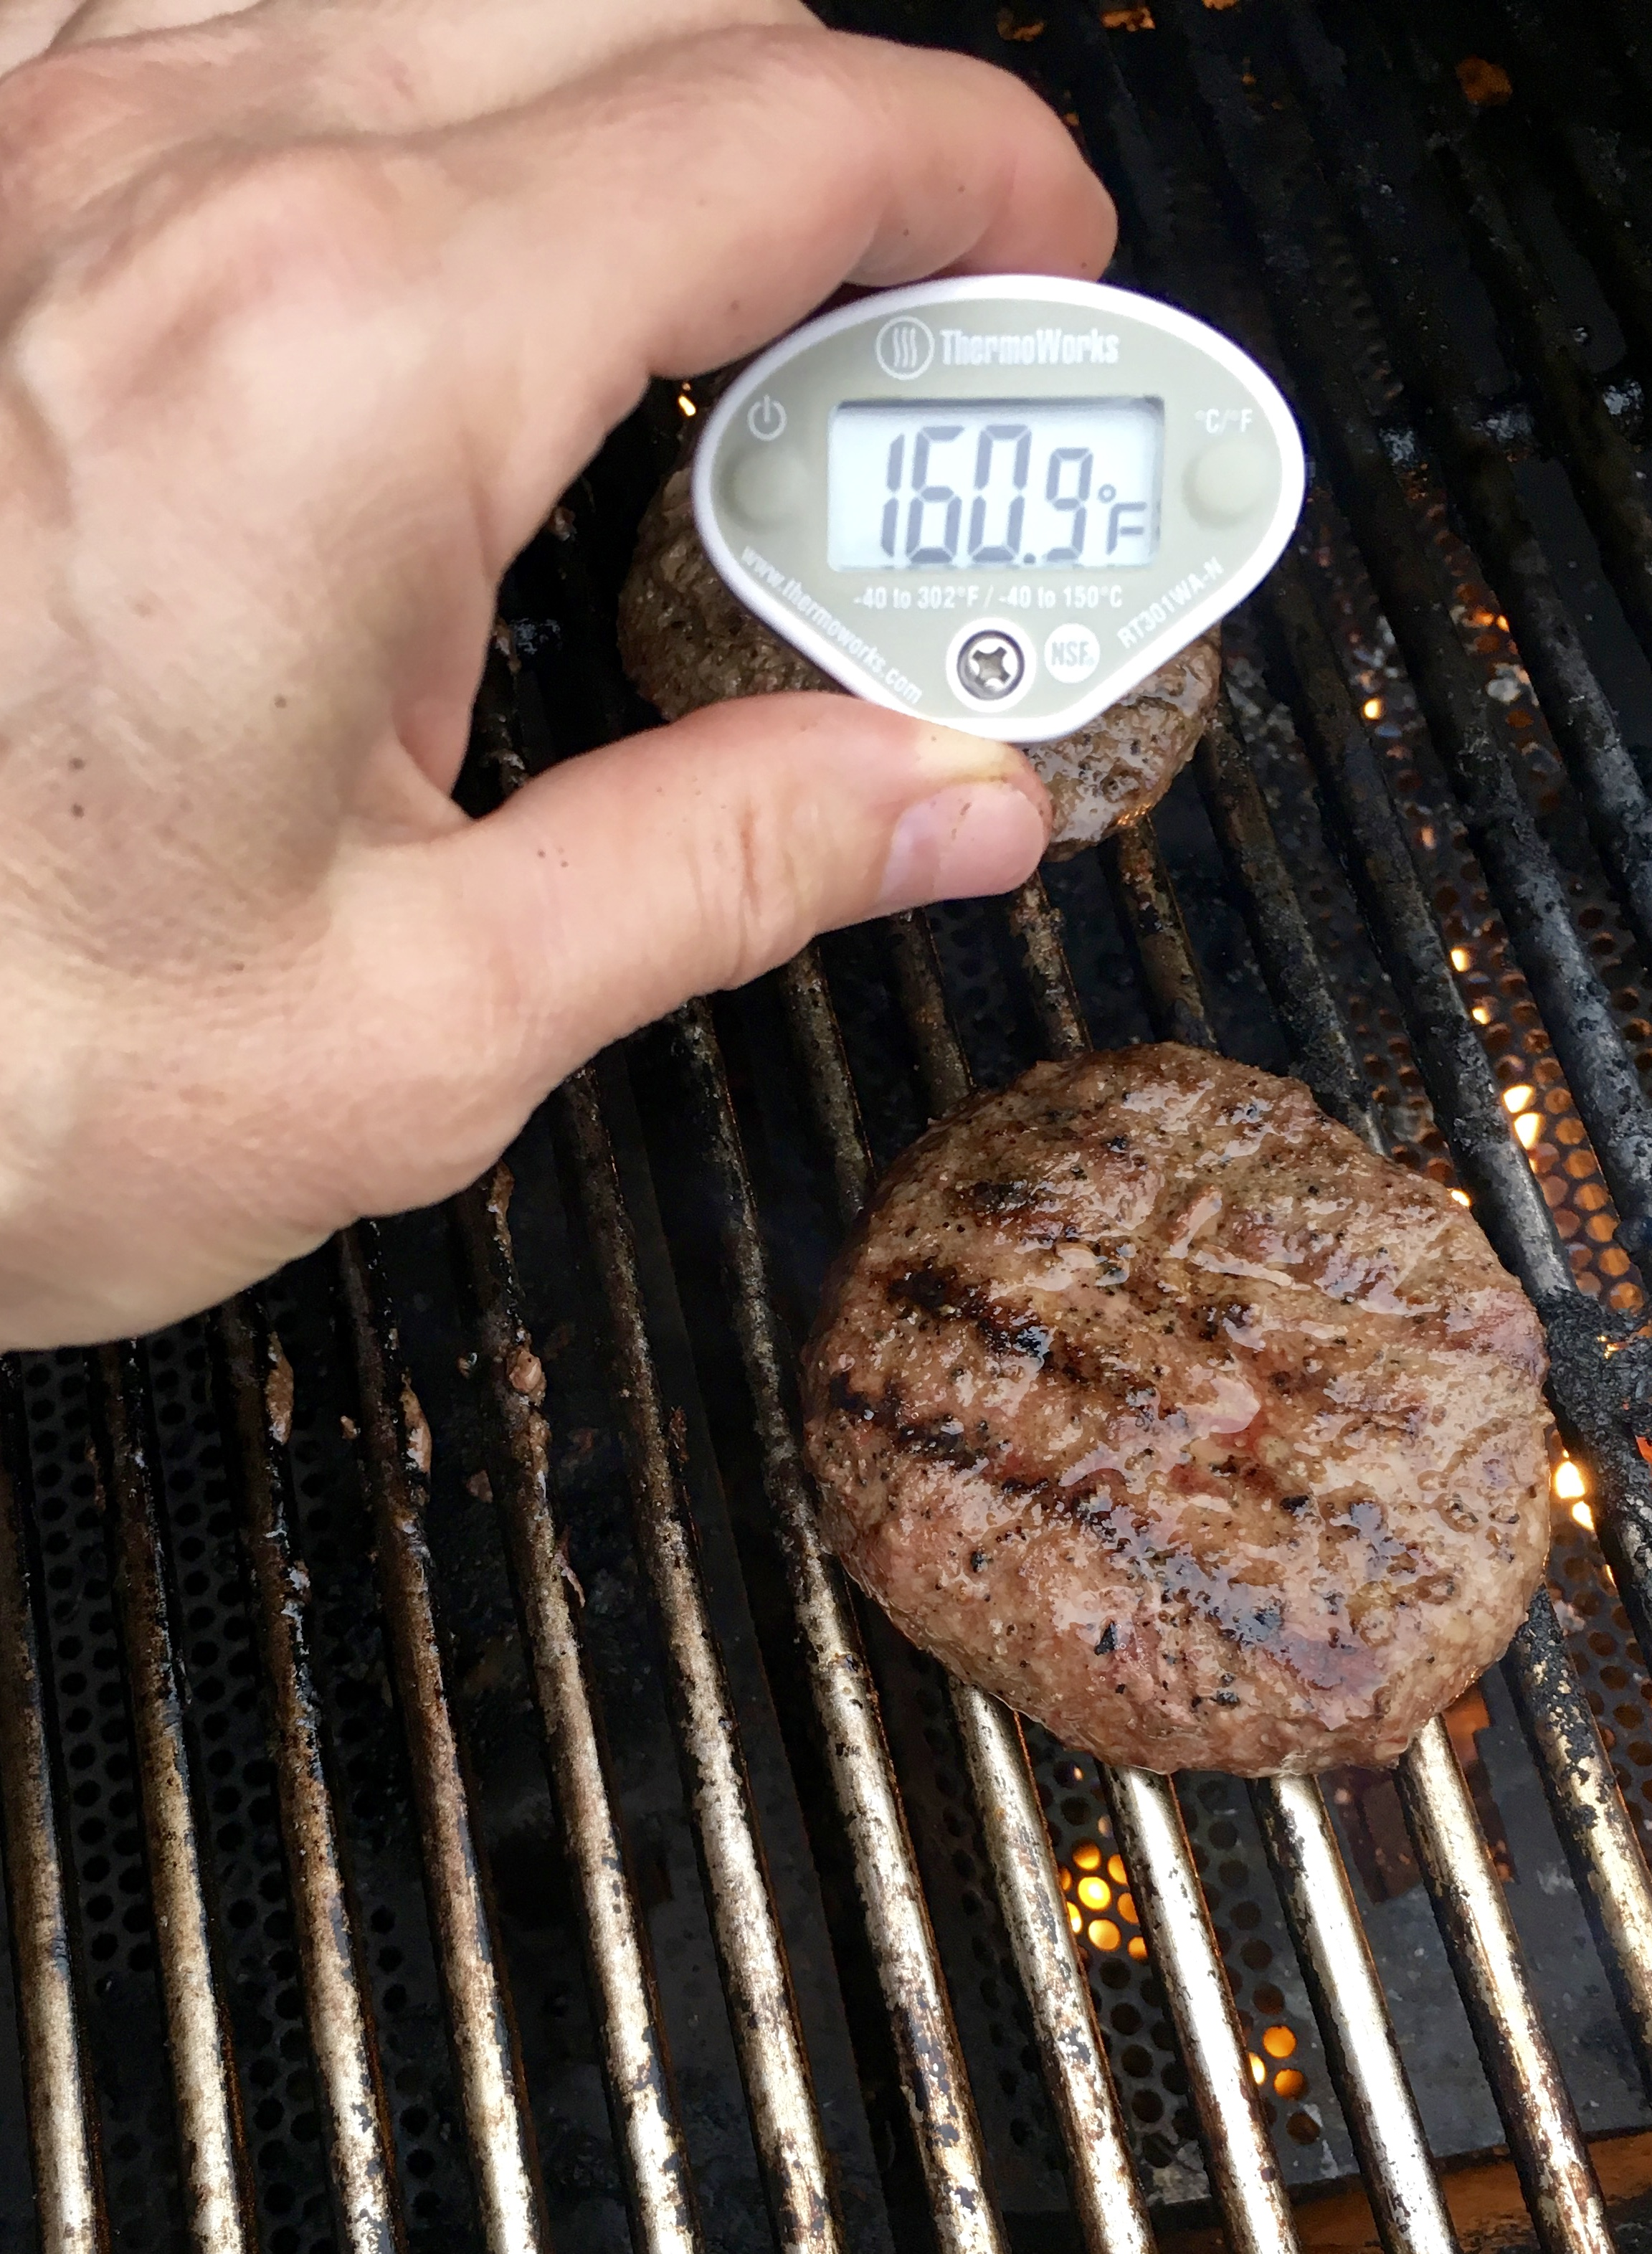 grilled hamburgers to 160F